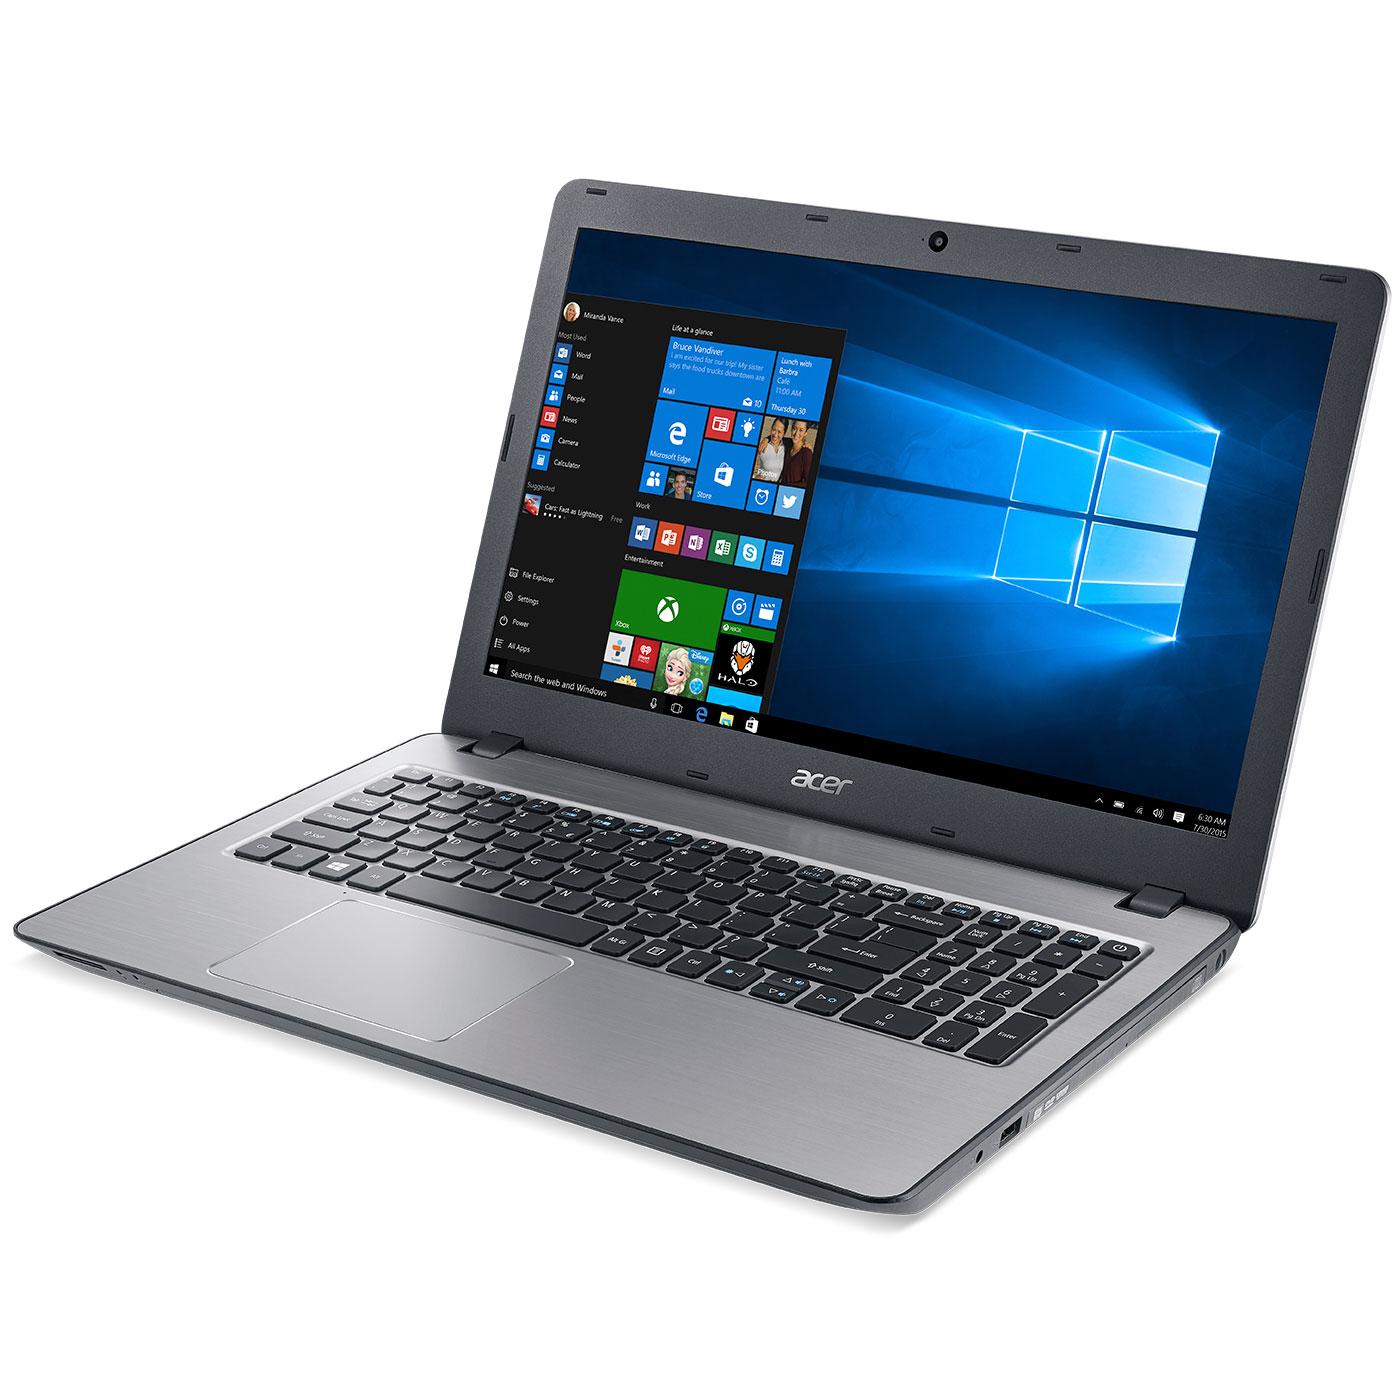 Acer Aspire F5 573G 58XJ